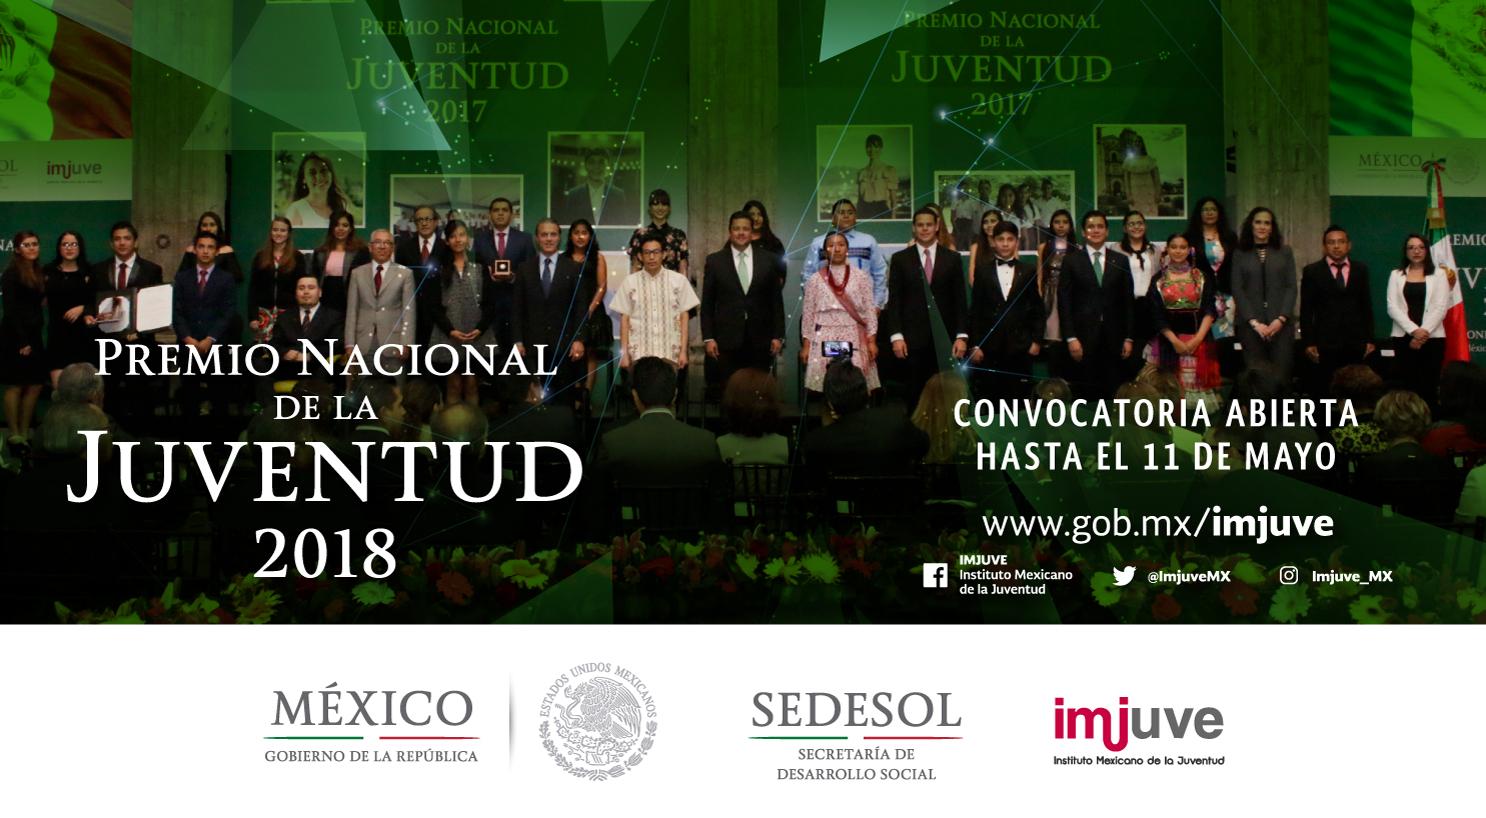 Premio Nacional de la Juventud 2018